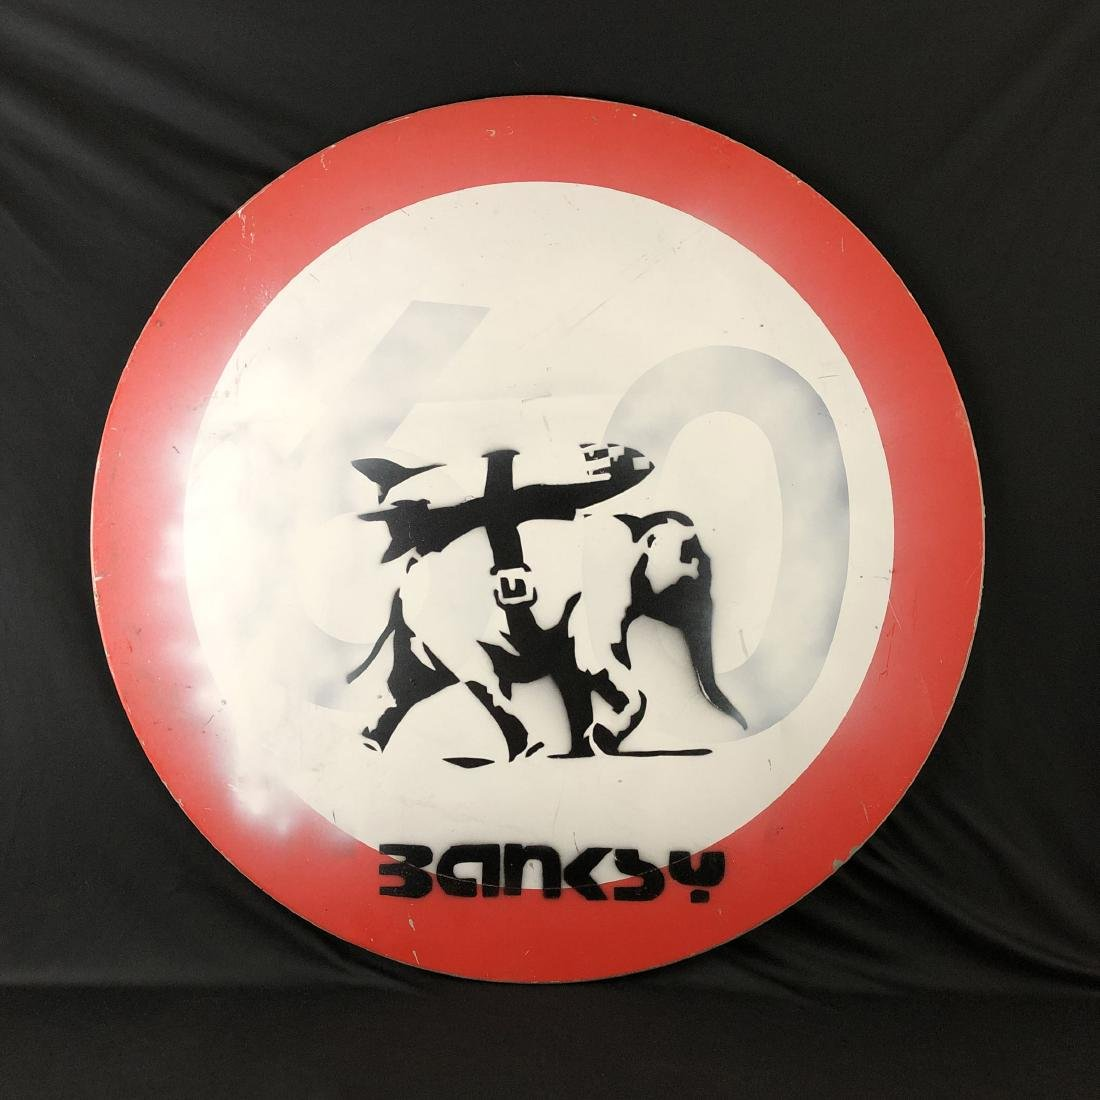 Banksy (British, 1974- ) - Graffiti Painting - style of